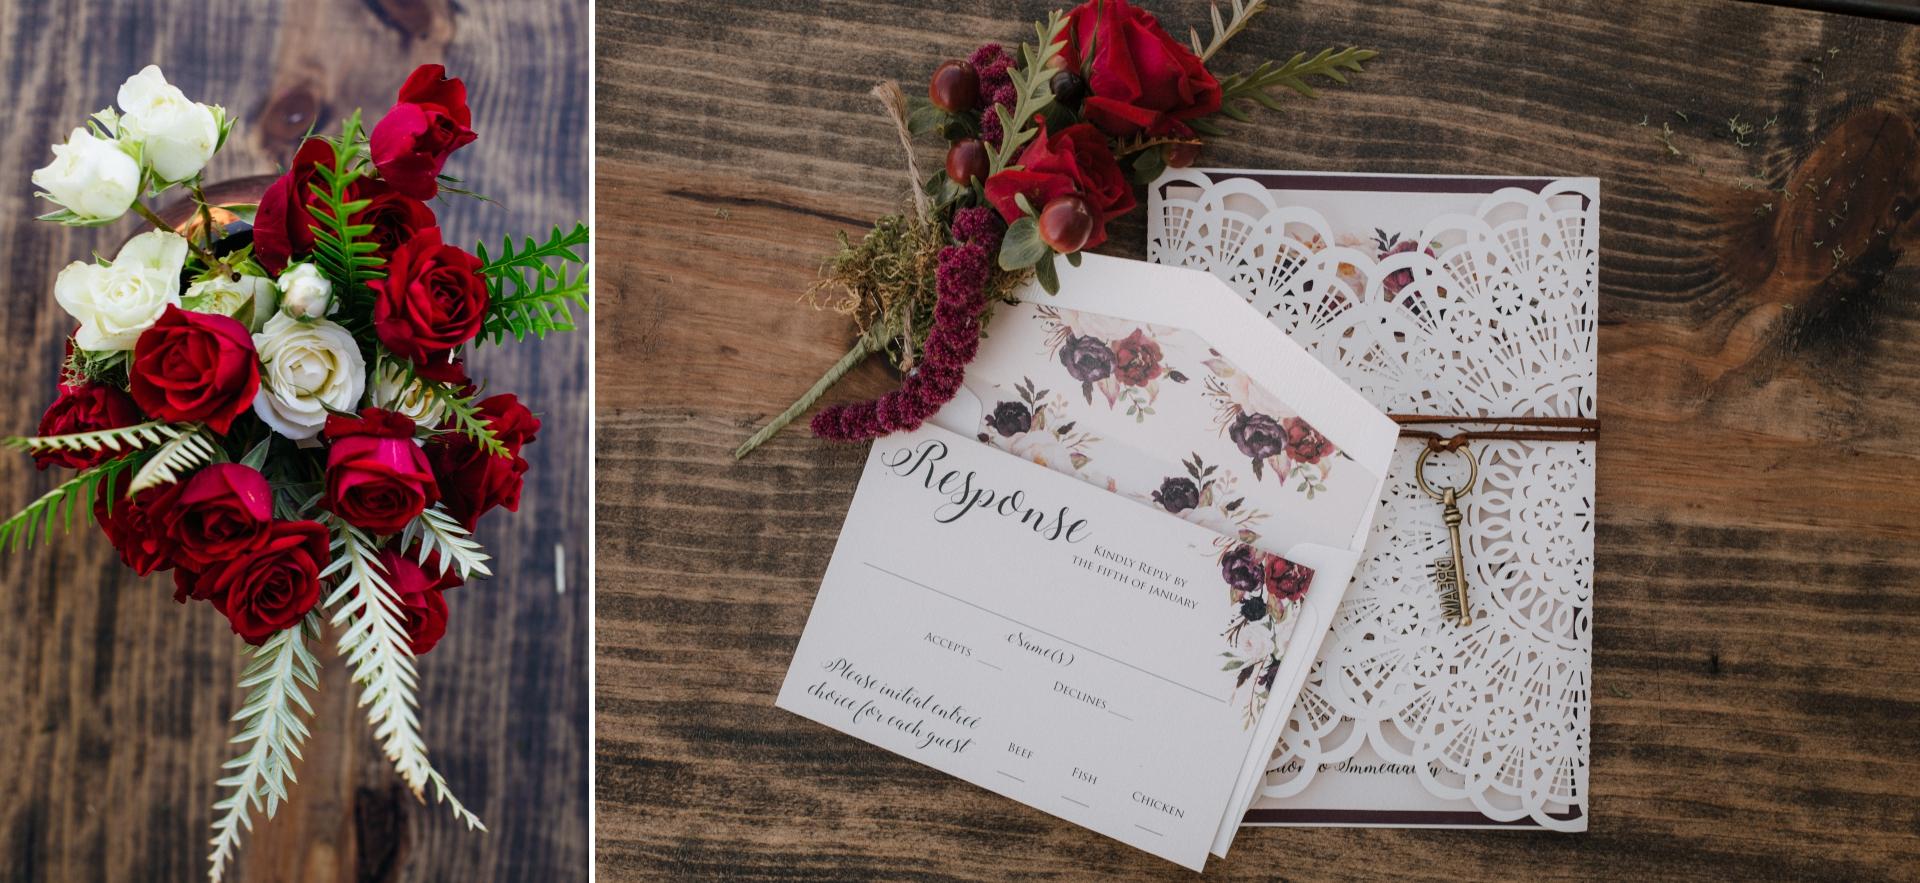 2018 Wedding Invitations